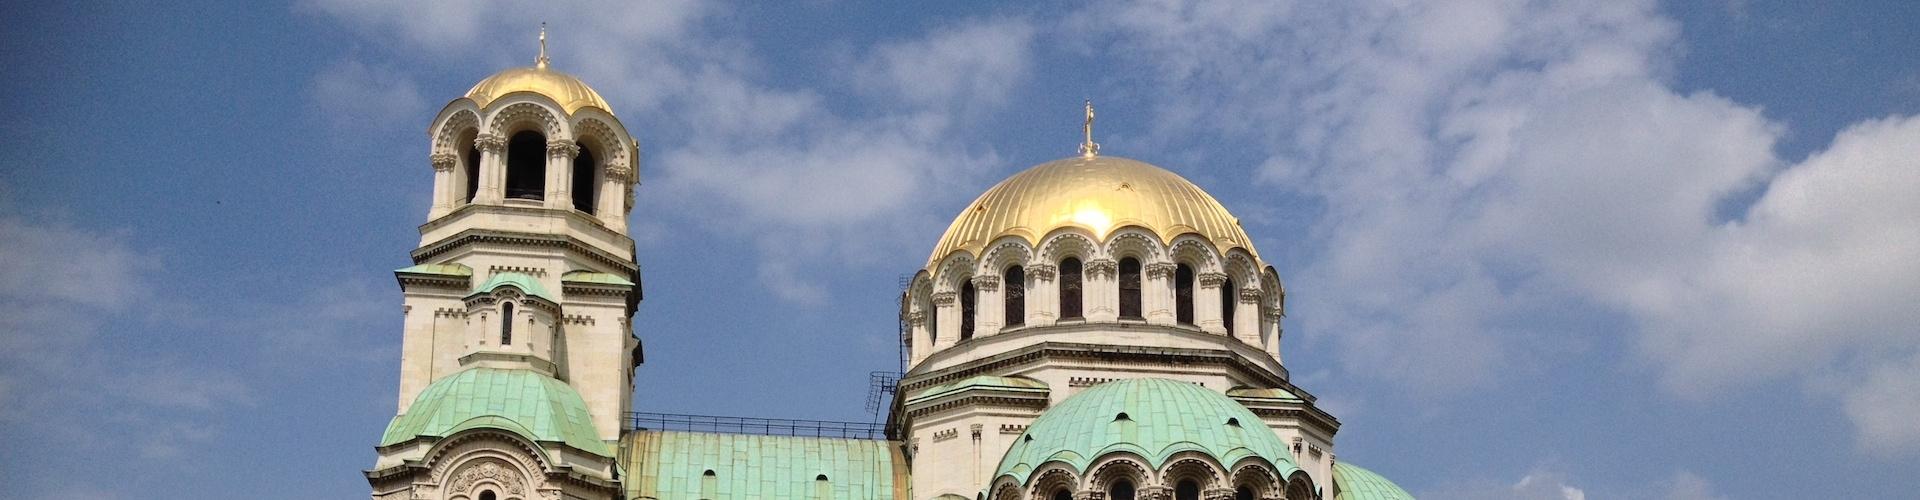 Saint Alexander Nevski Cathedral, Sofia Bulgaria